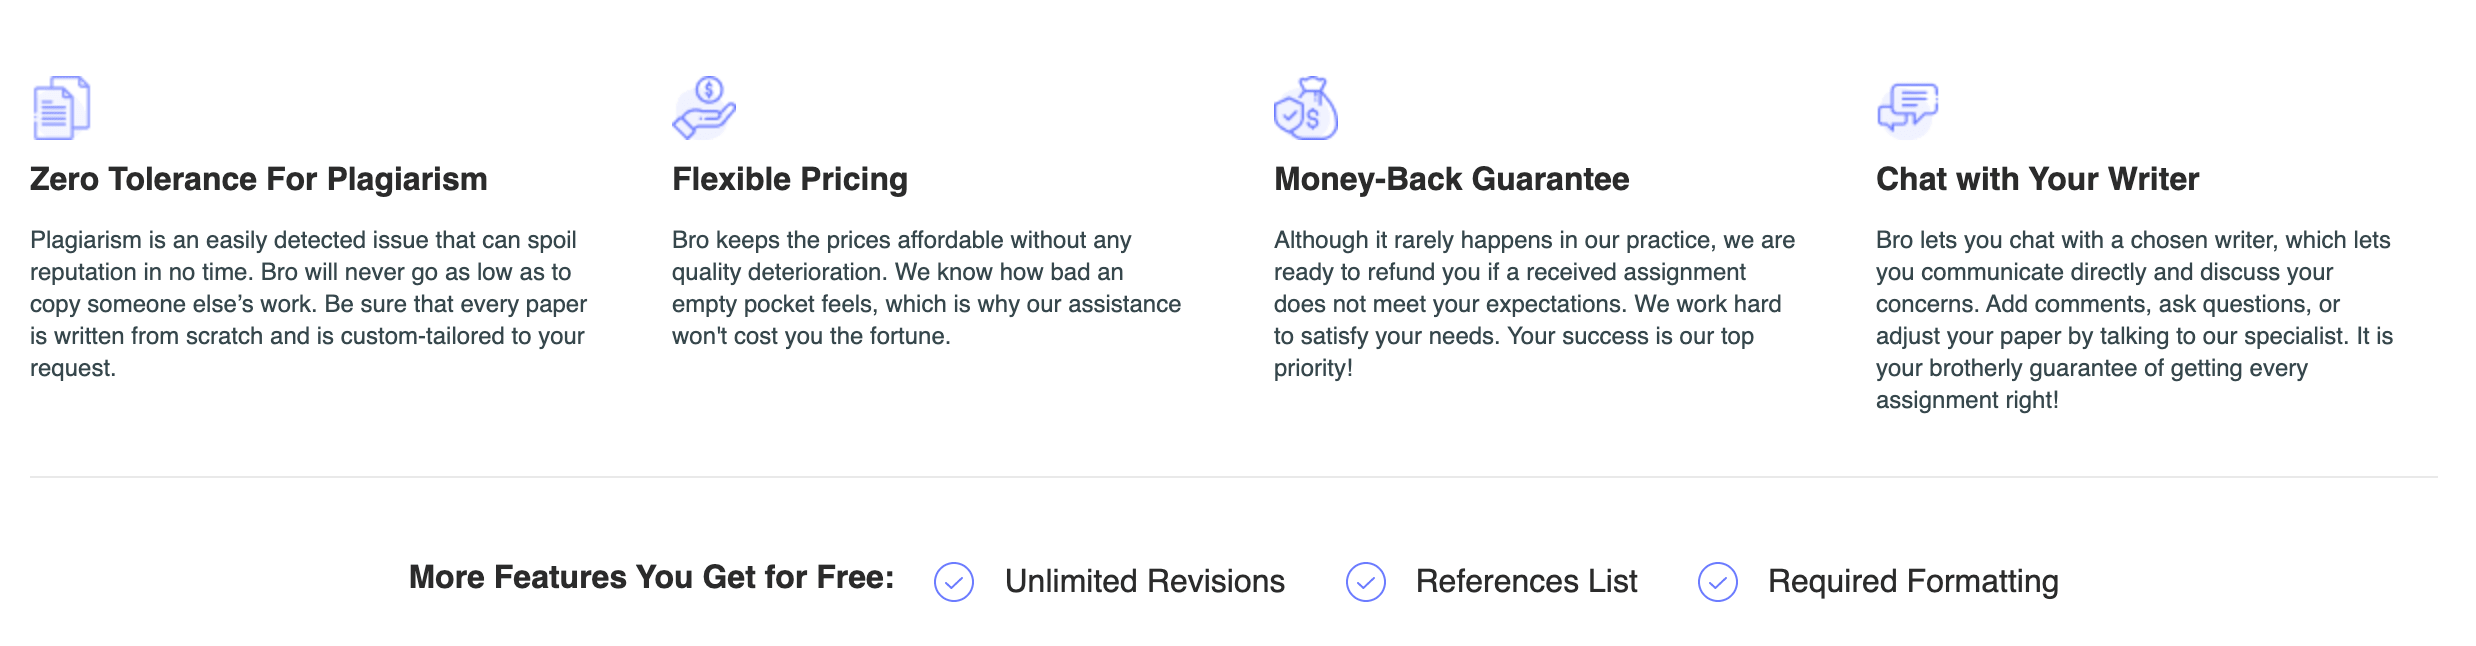 assignmentbro guarantees review